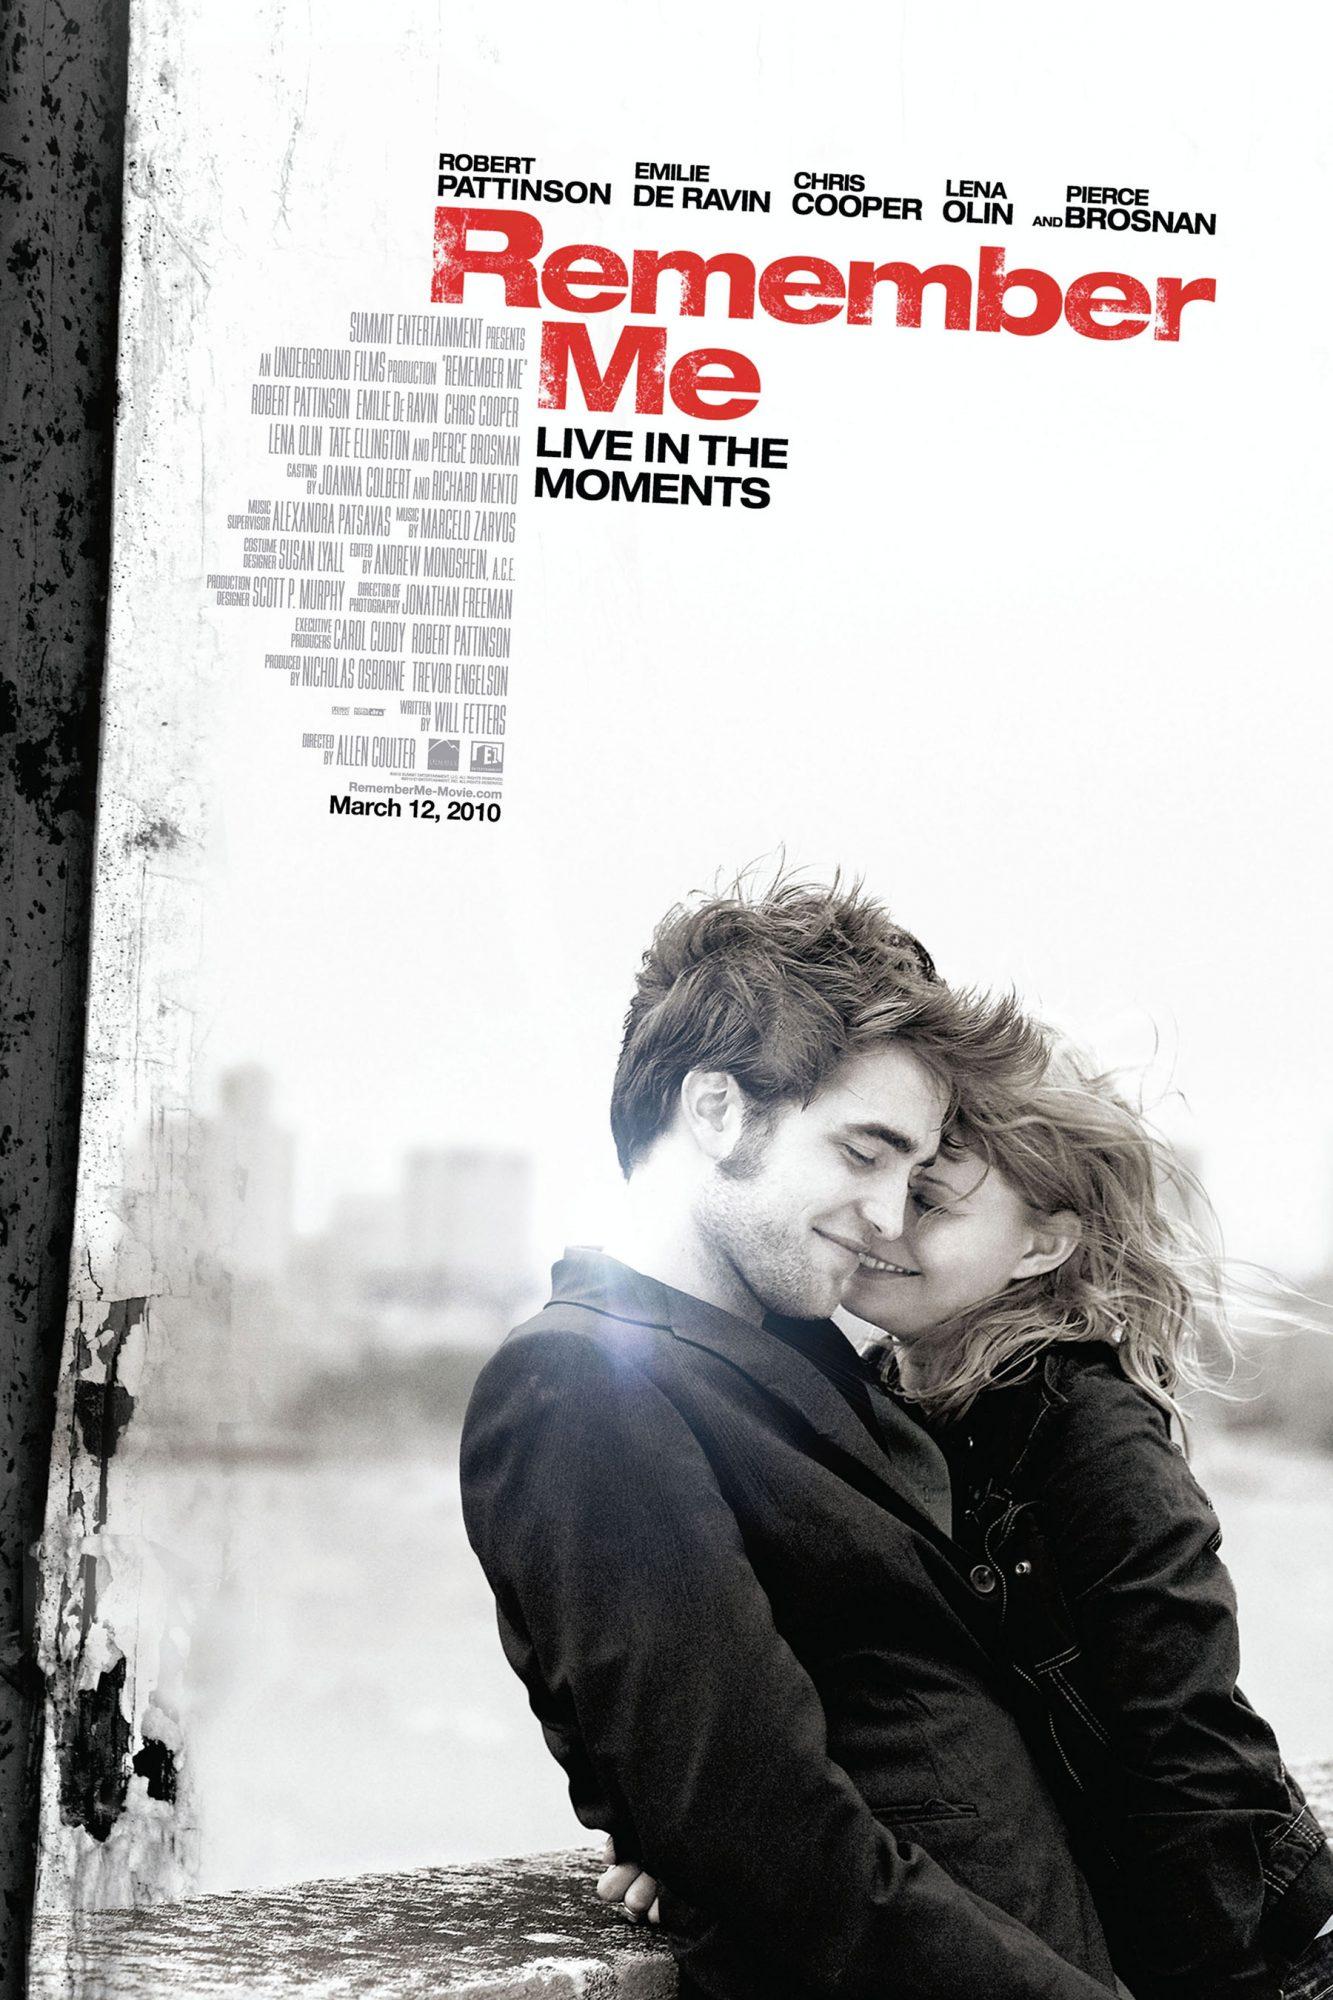 REMEMBER ME, from left: Robert Pattinson, Emilie de Ravin, 2010. ©Summit Entertainment/courtesy Ever